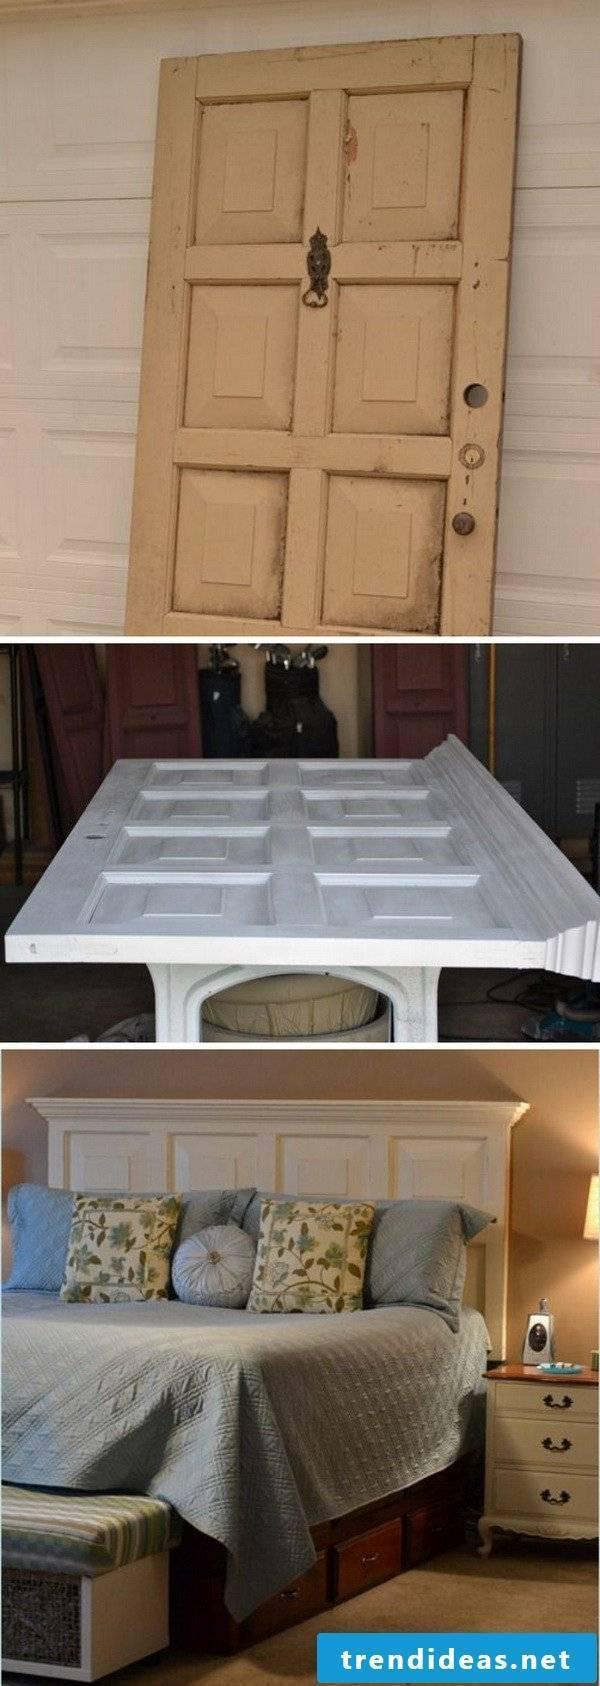 DIY furniture with old doors